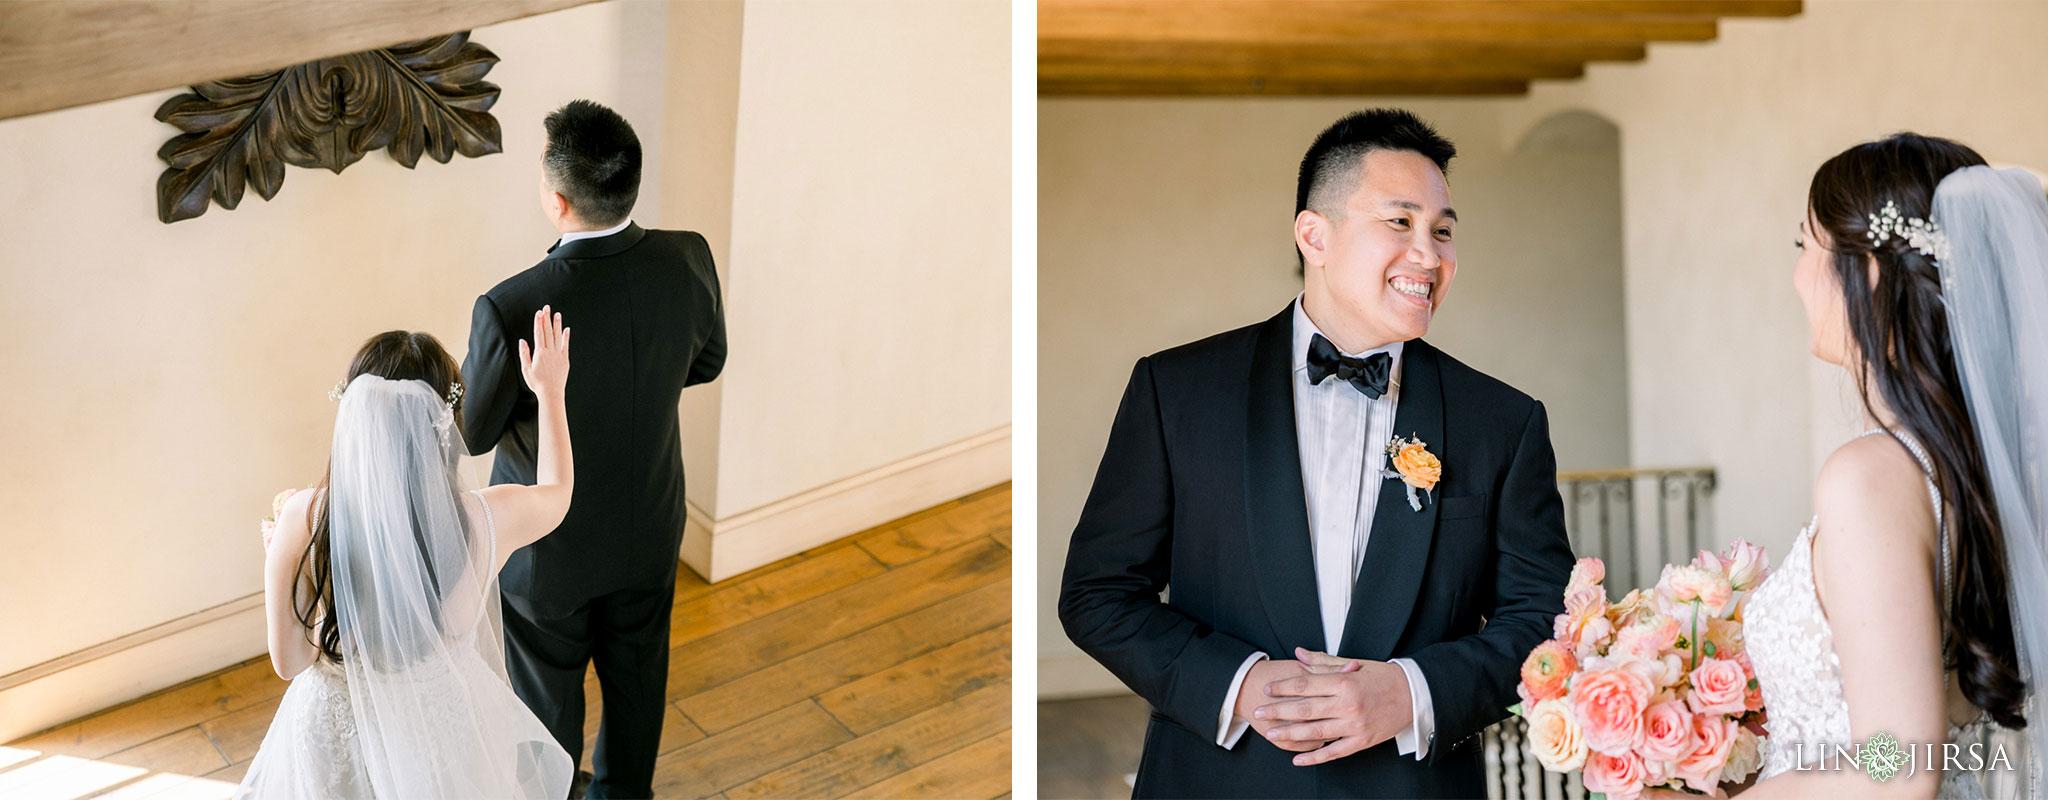 012 malibu rocky oaks filmic wedding photography